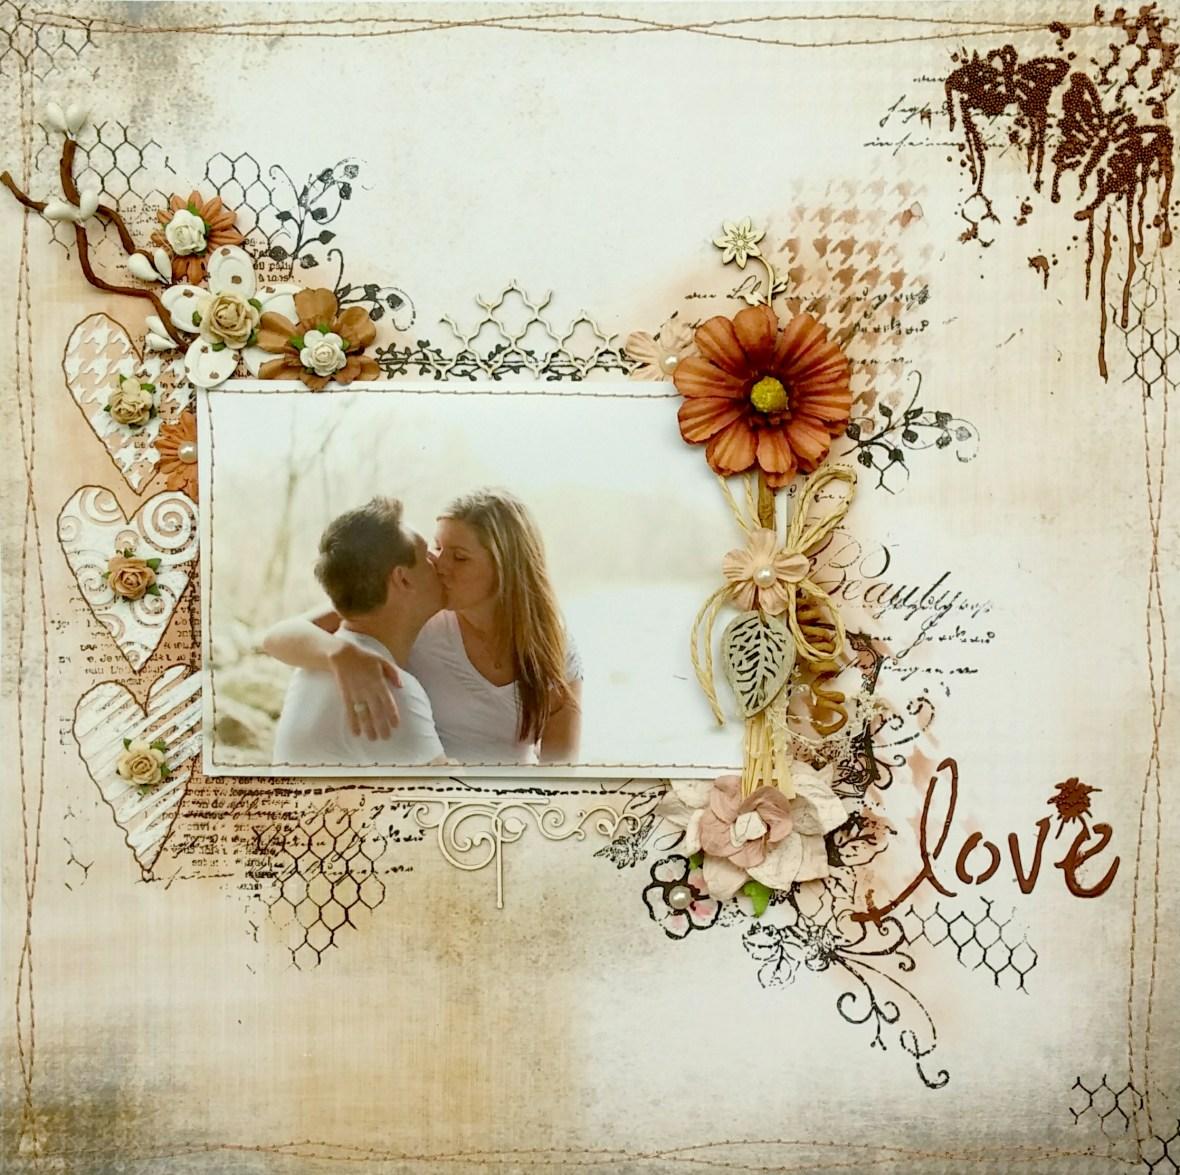 Love]